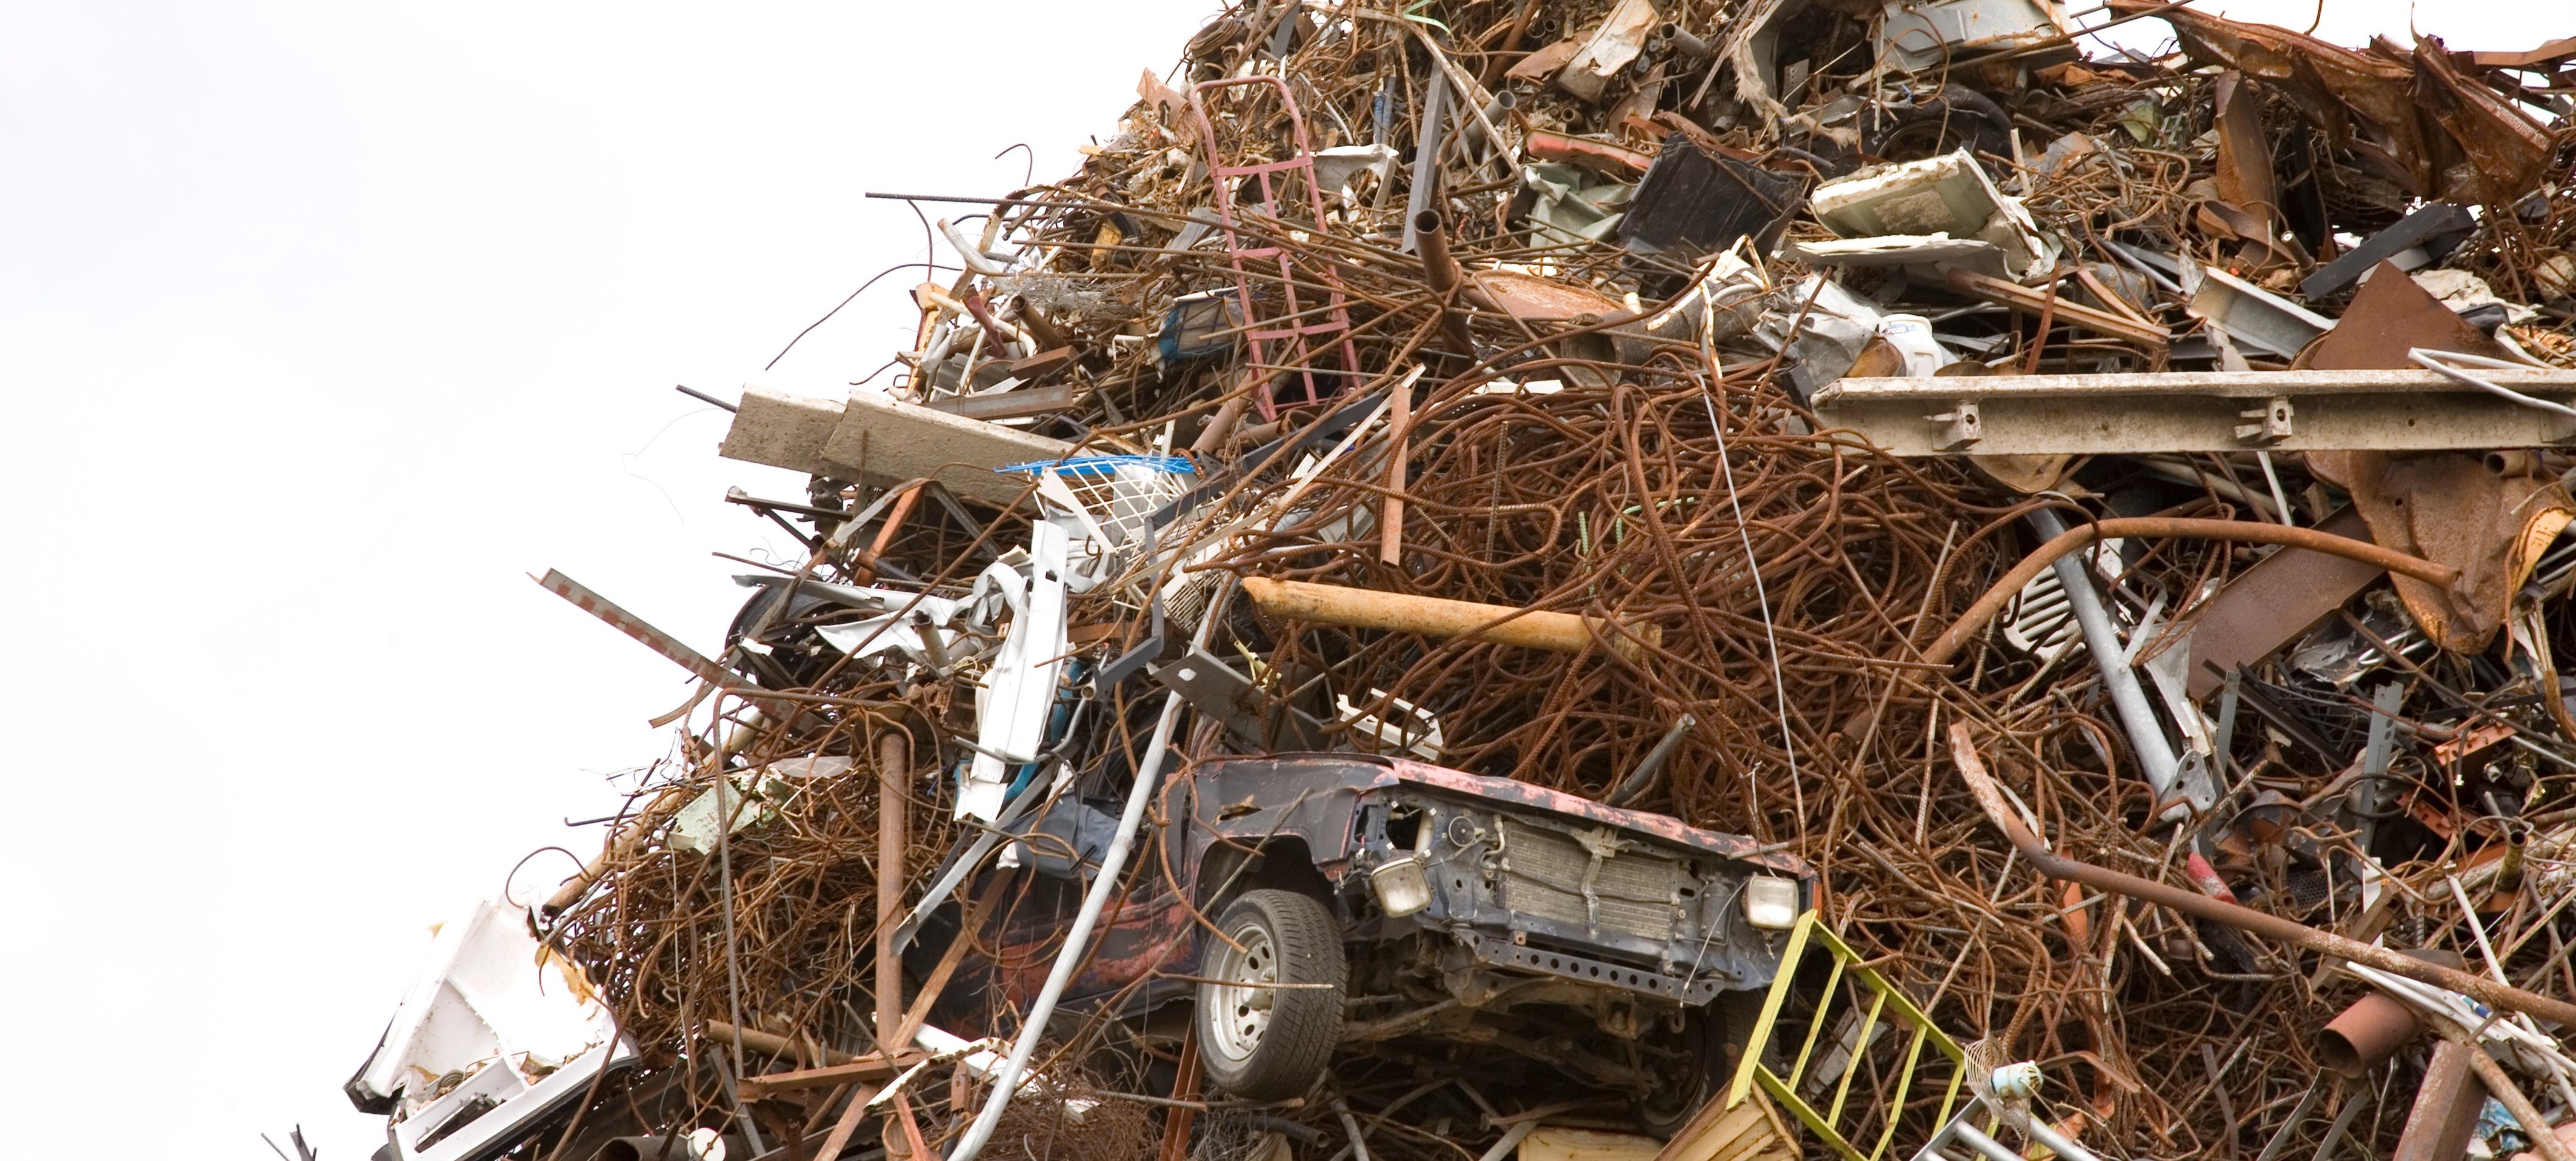 iStock-173926237_metal stock pile